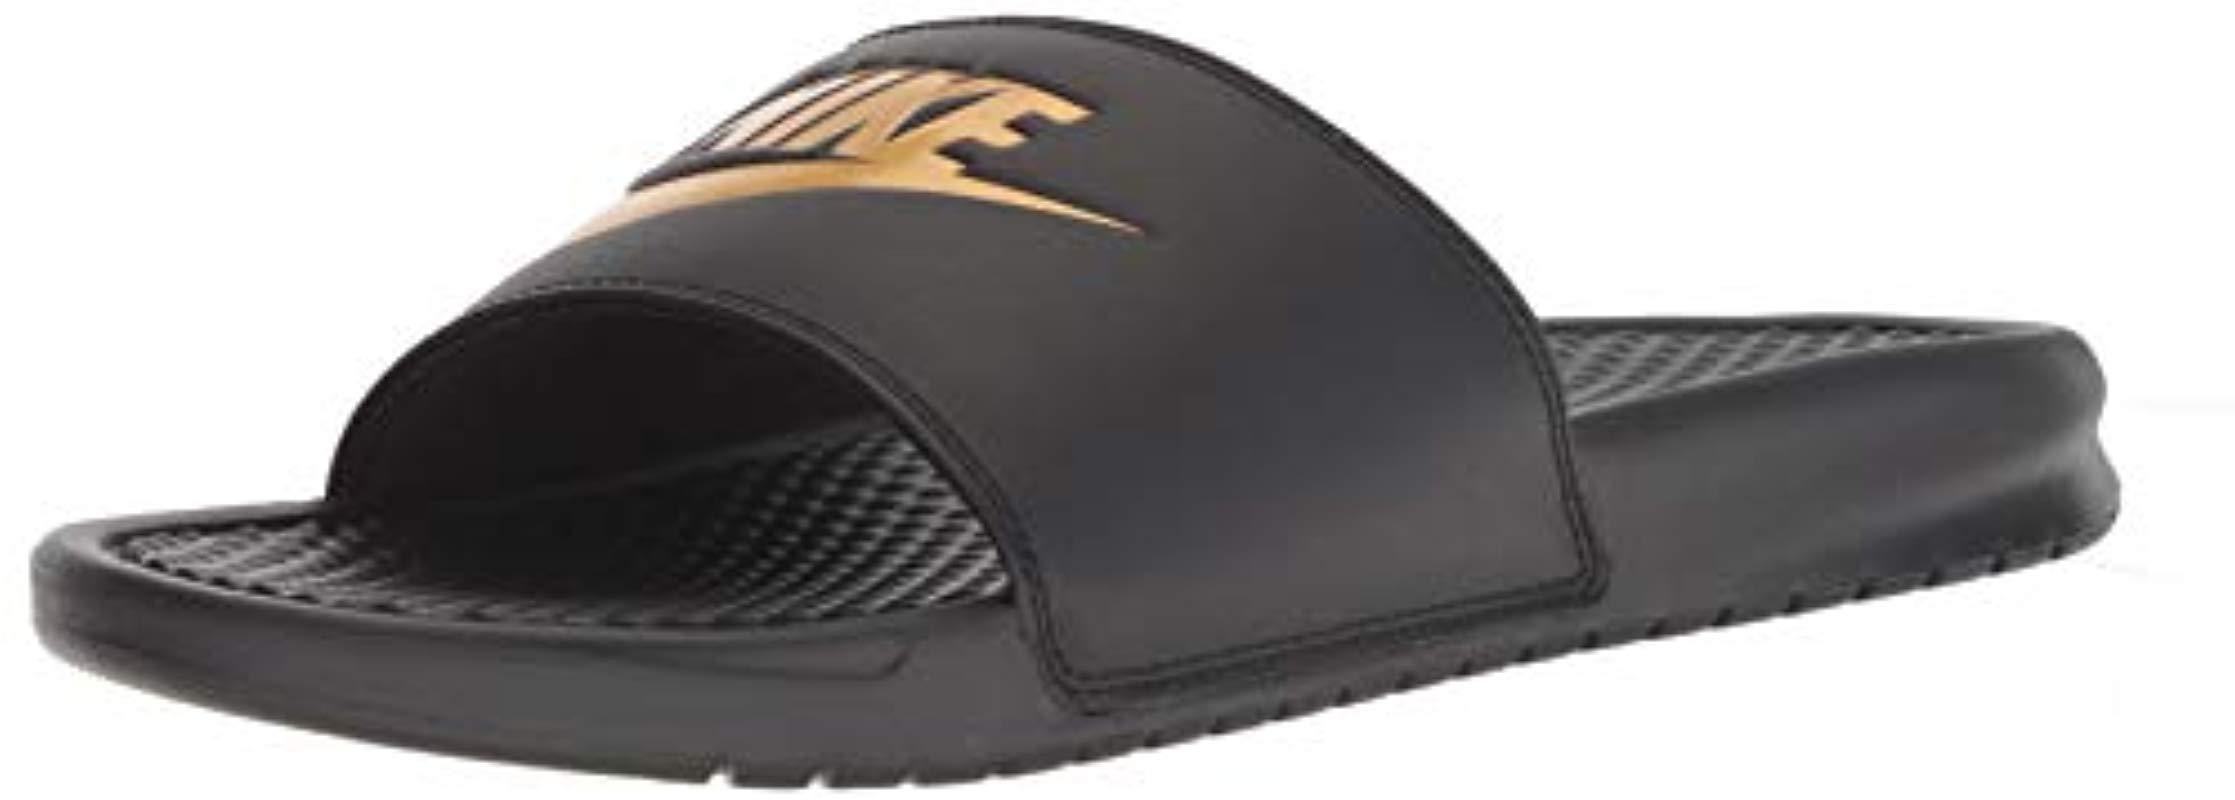 49a72a2fab9a Nike  s Benassi Blue Flip Flops in Black for Men - Lyst